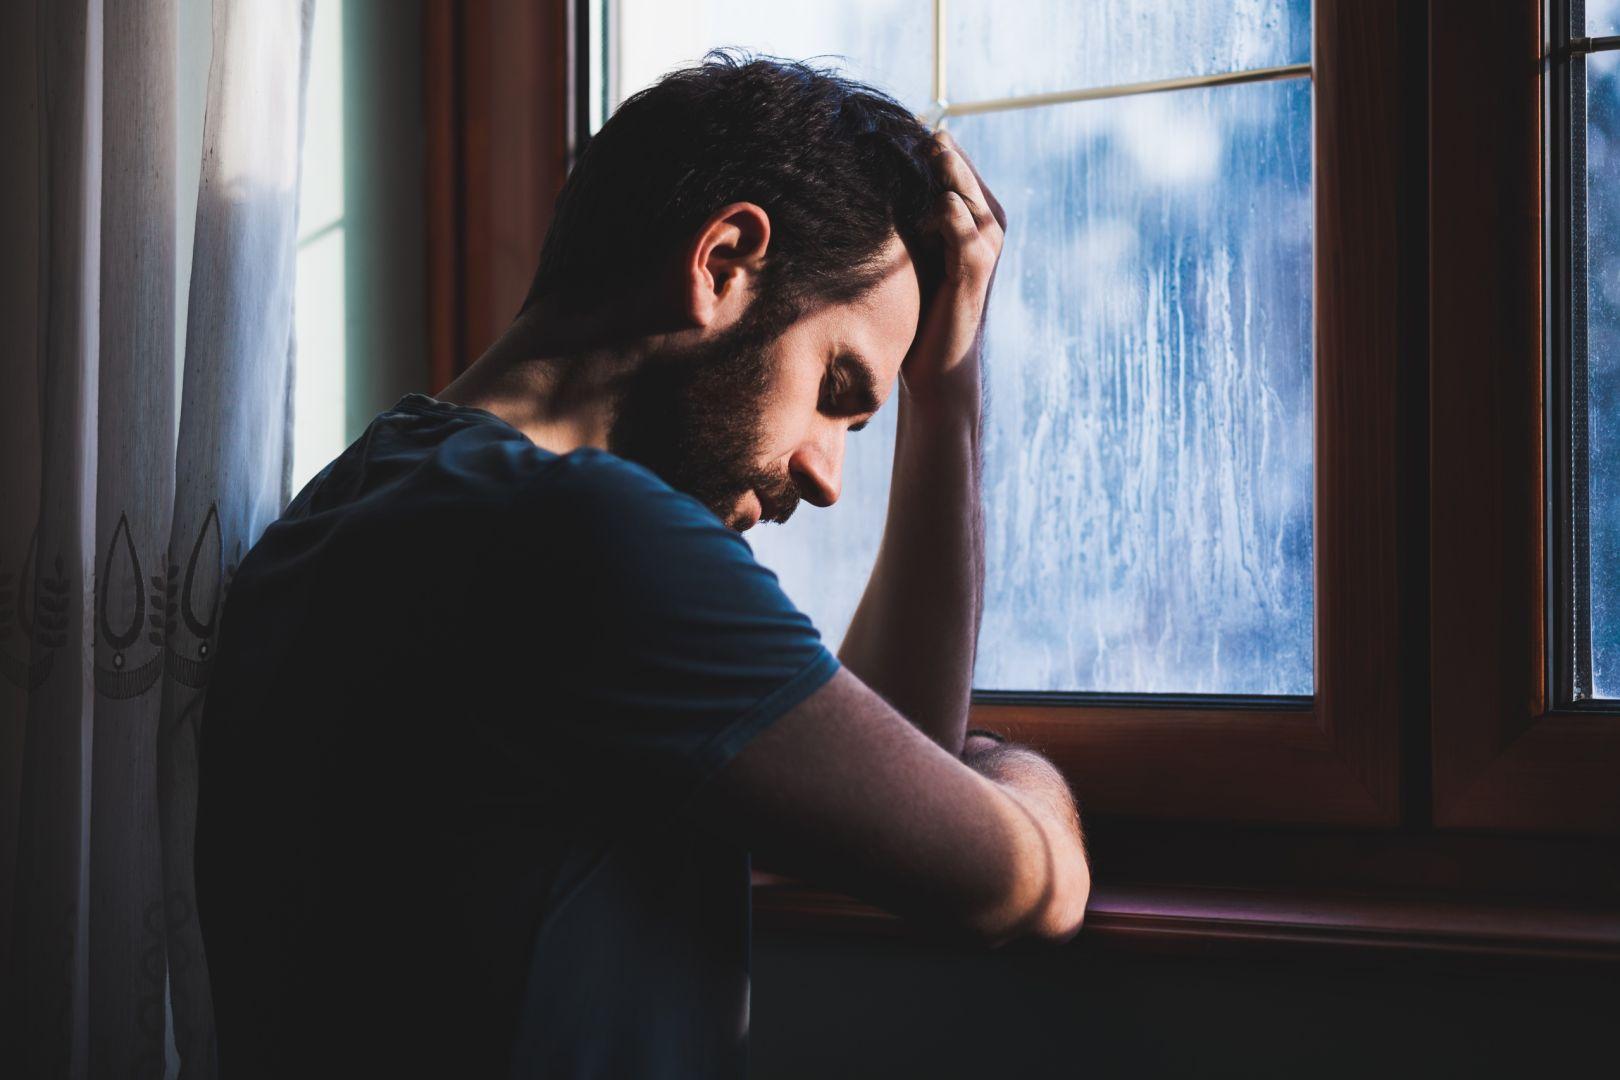 بالصور صور رجل حزين , لقطات لرجل حزين 1768 1